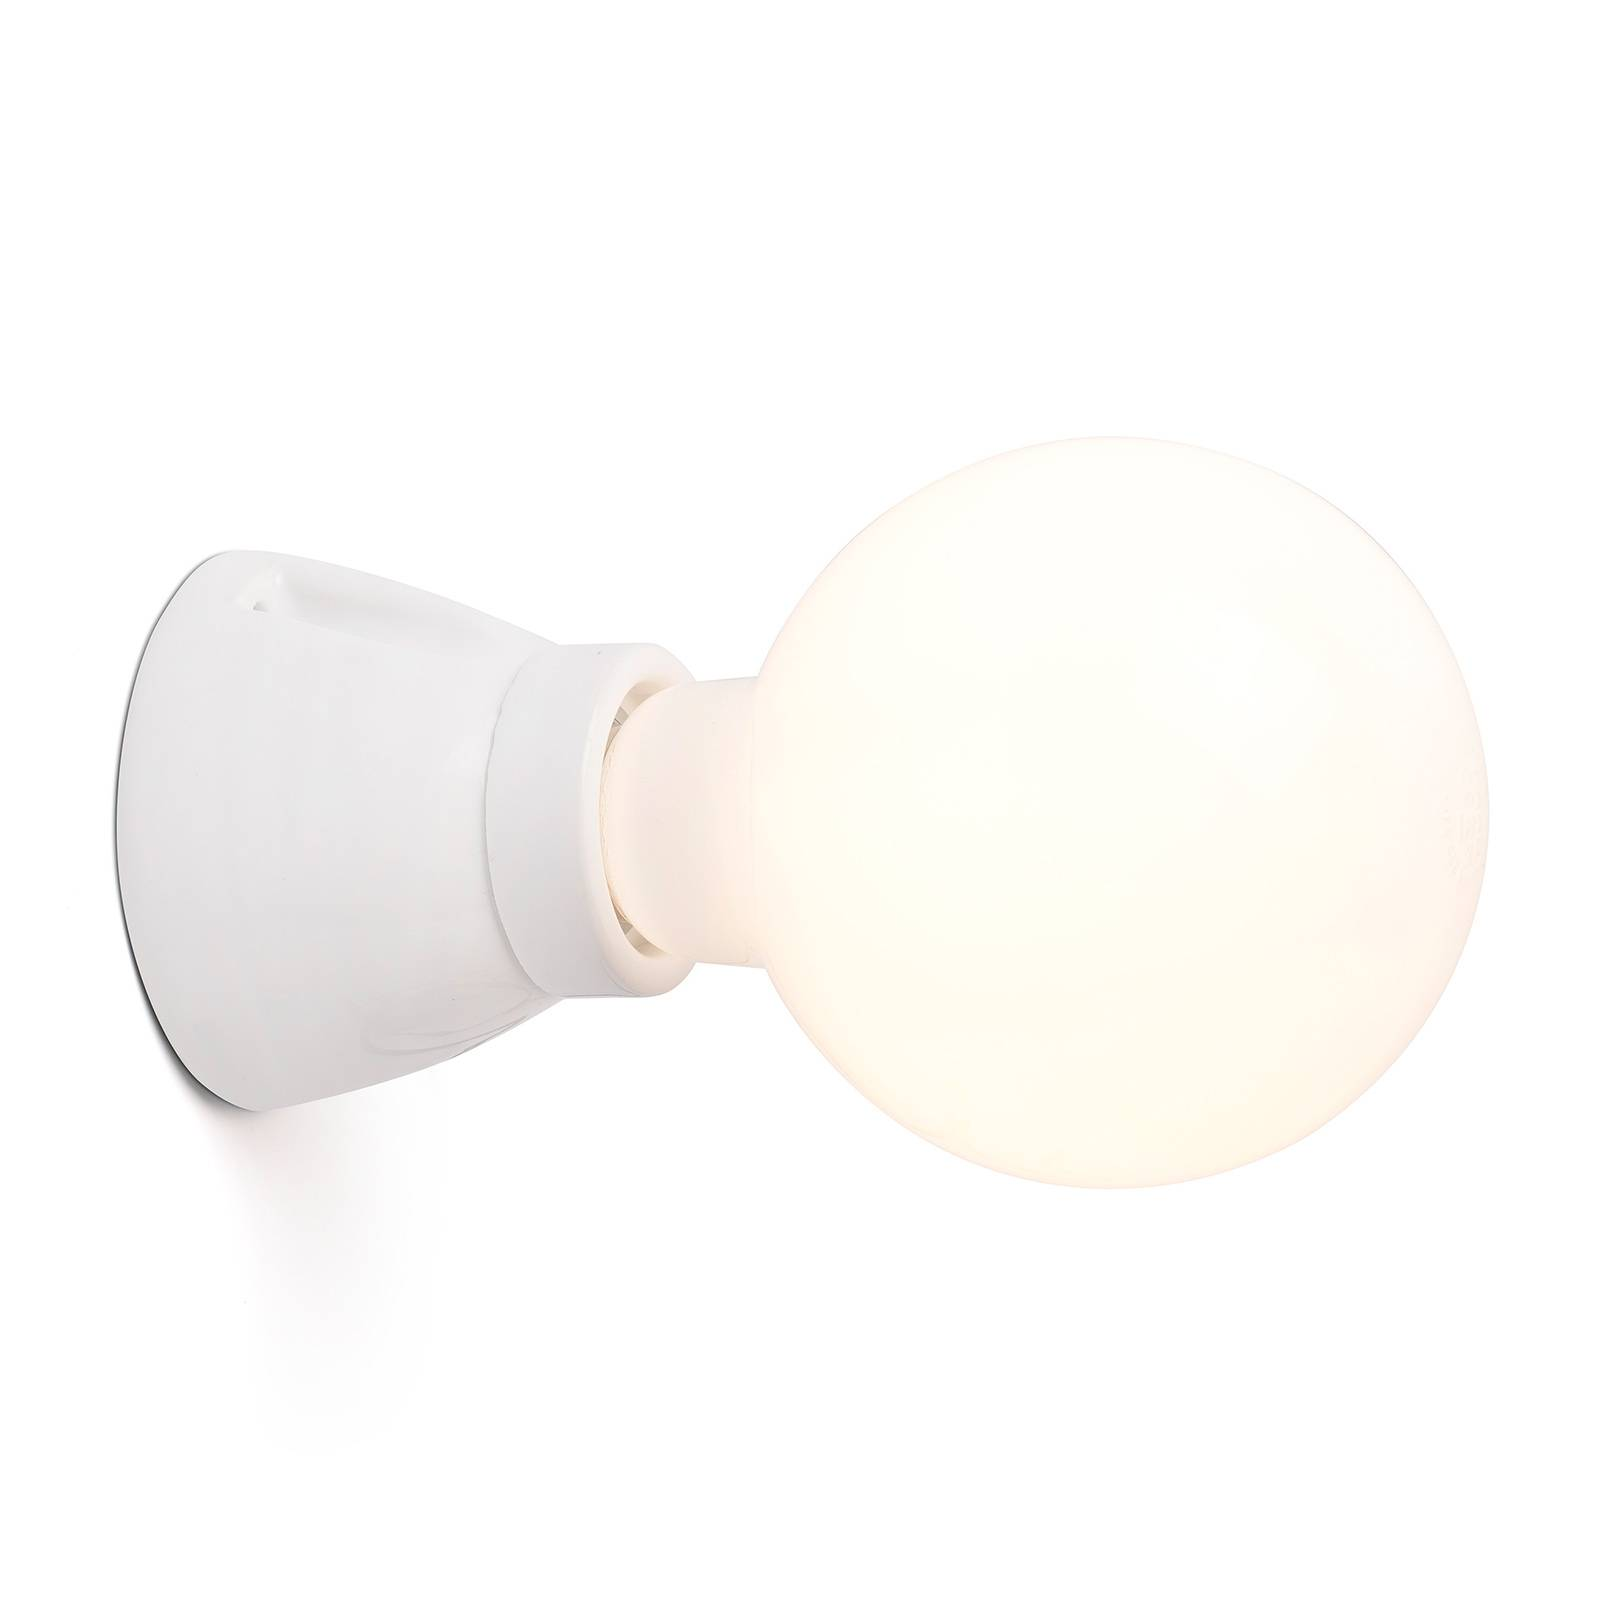 Wandlamp Kera, wit